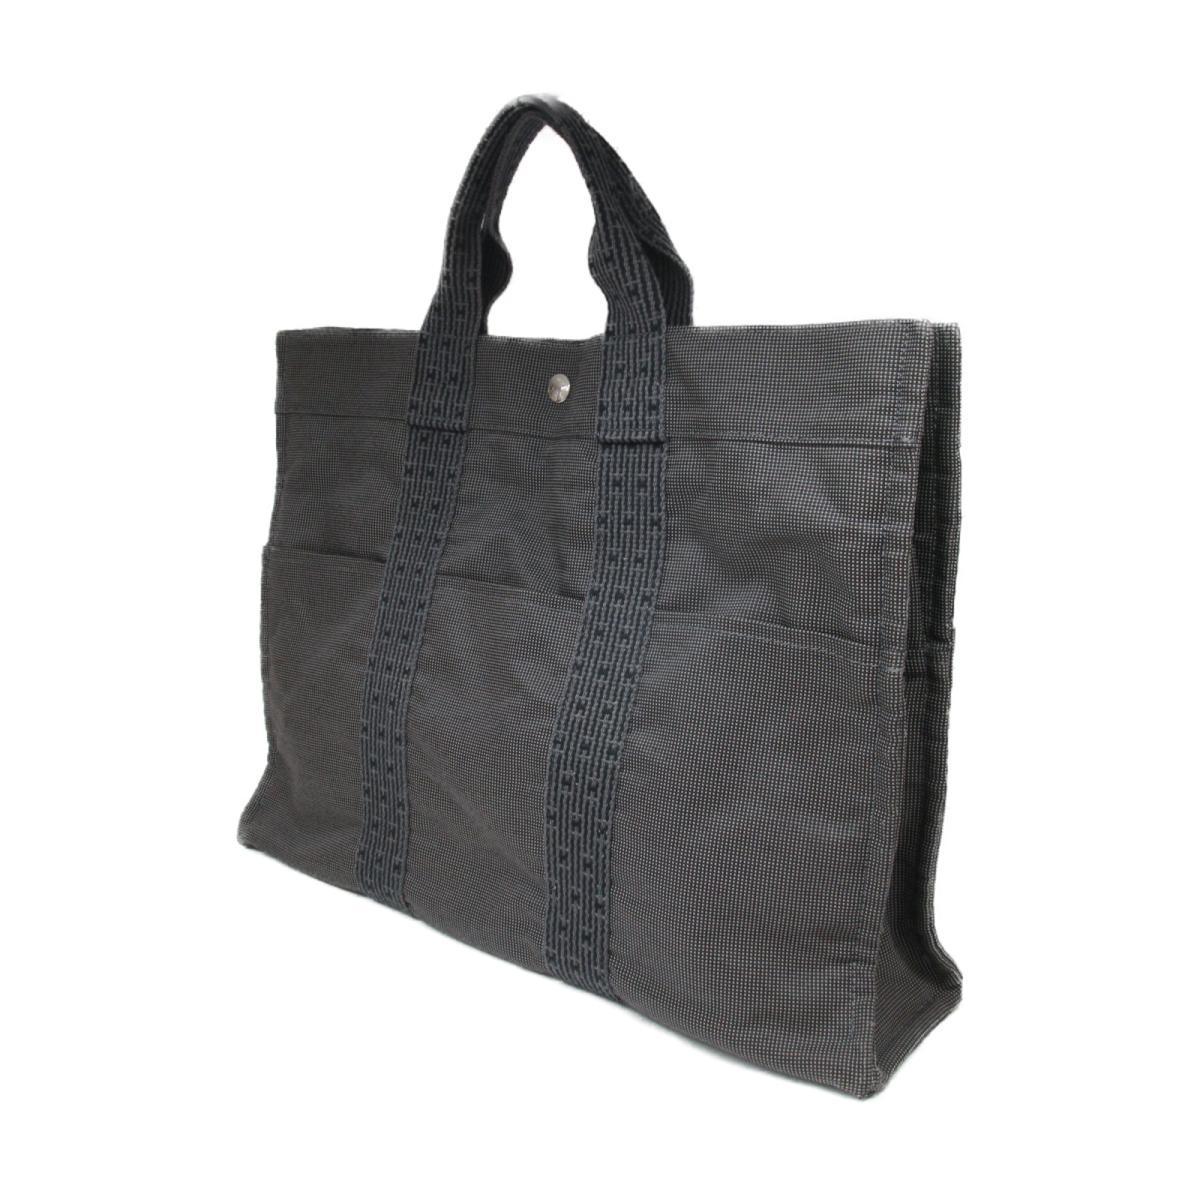 29bf6befd BRANDOFF: Auth HERMES Herline tote MM Hand bag Nylon Used Vintage |  BRANDOFF Ginza/TOKYO/Japan | Rakuten Global Market